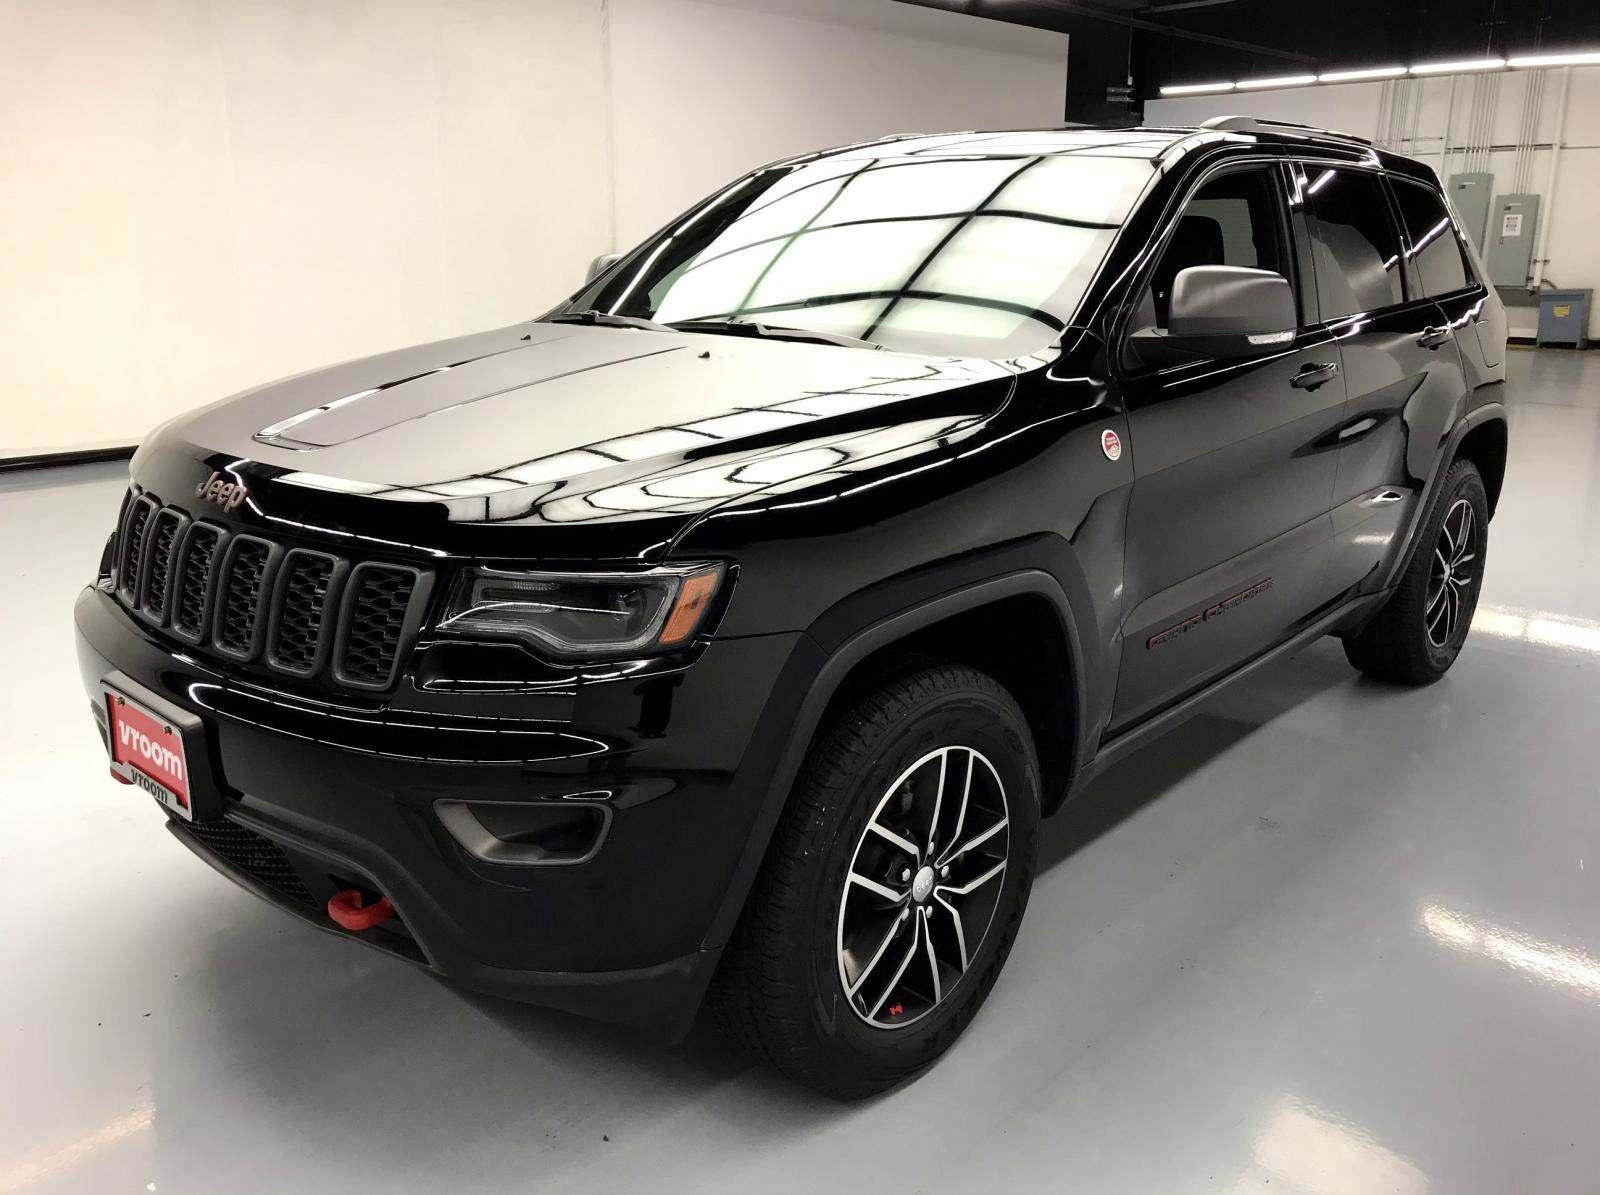 used Jeep Grand Cherokee 2018 vin: 1C4RJFLG1JC335039